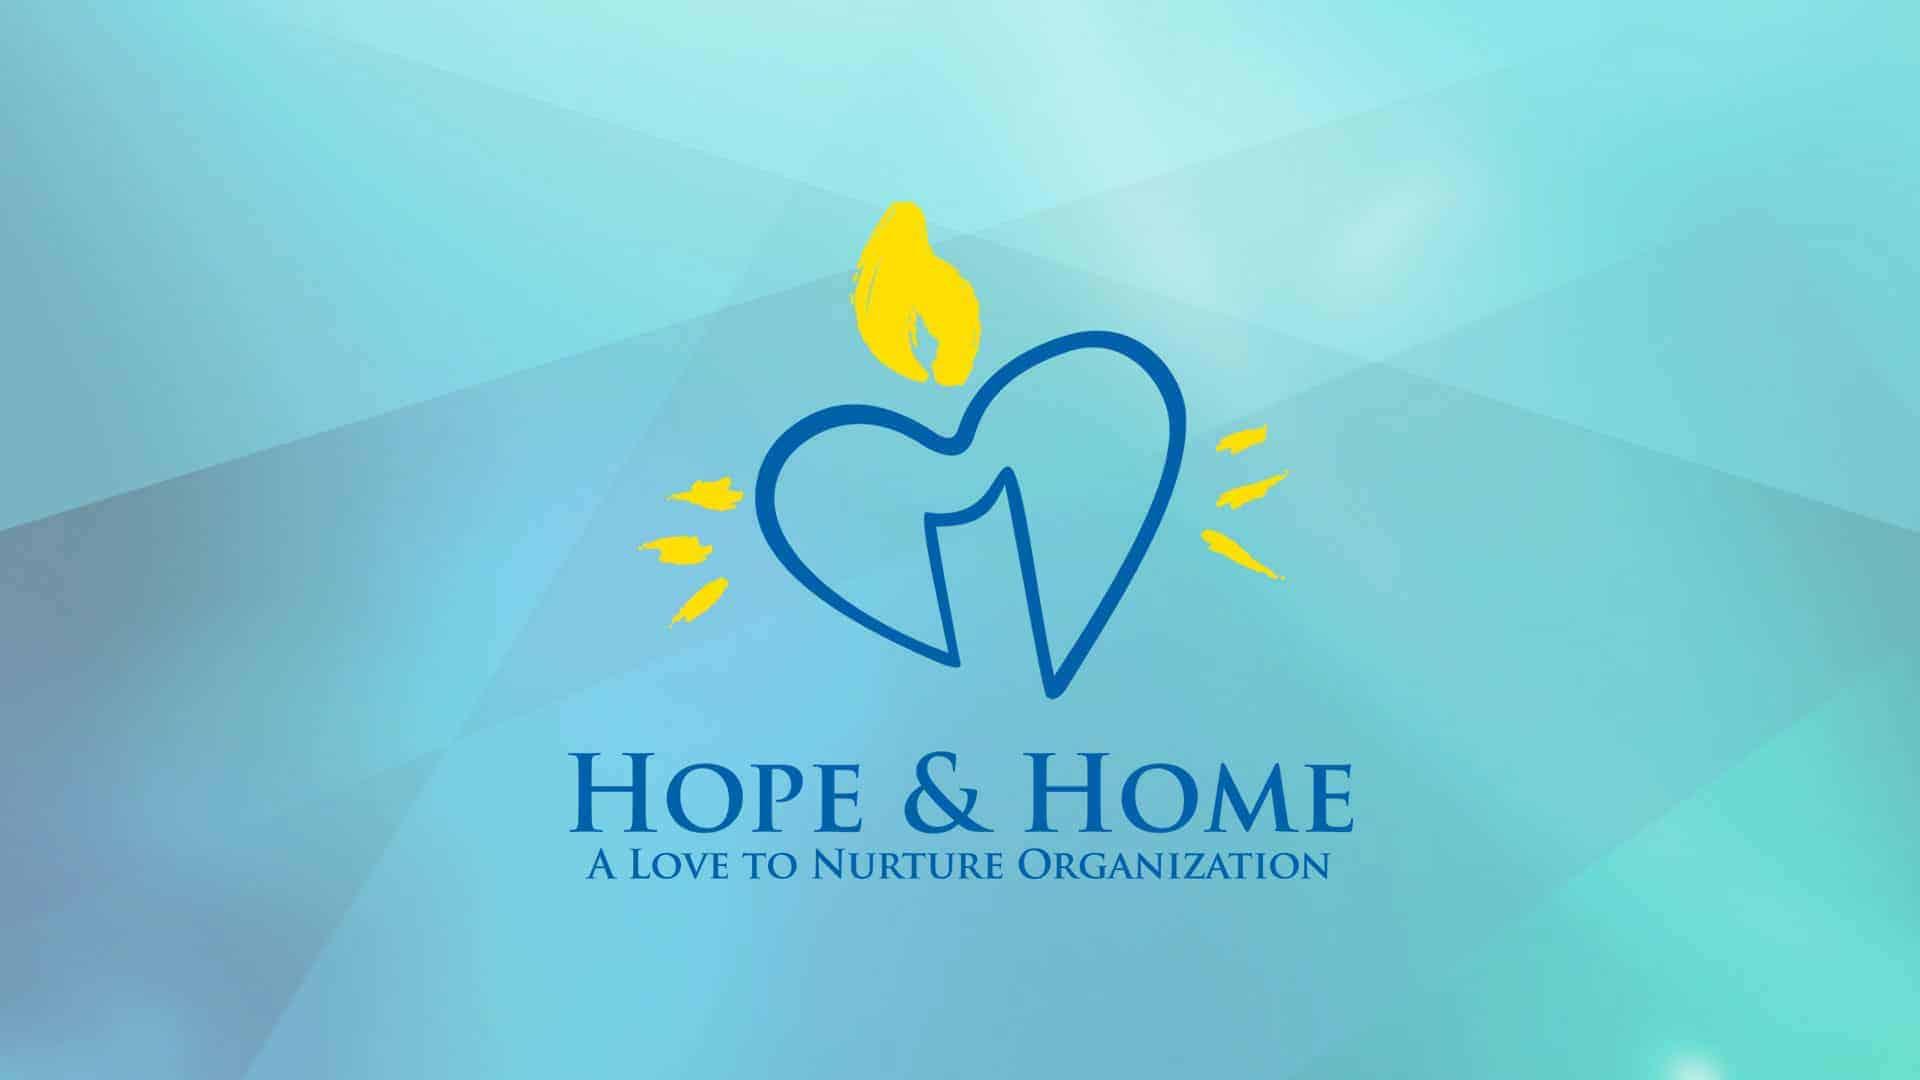 Hope & Home